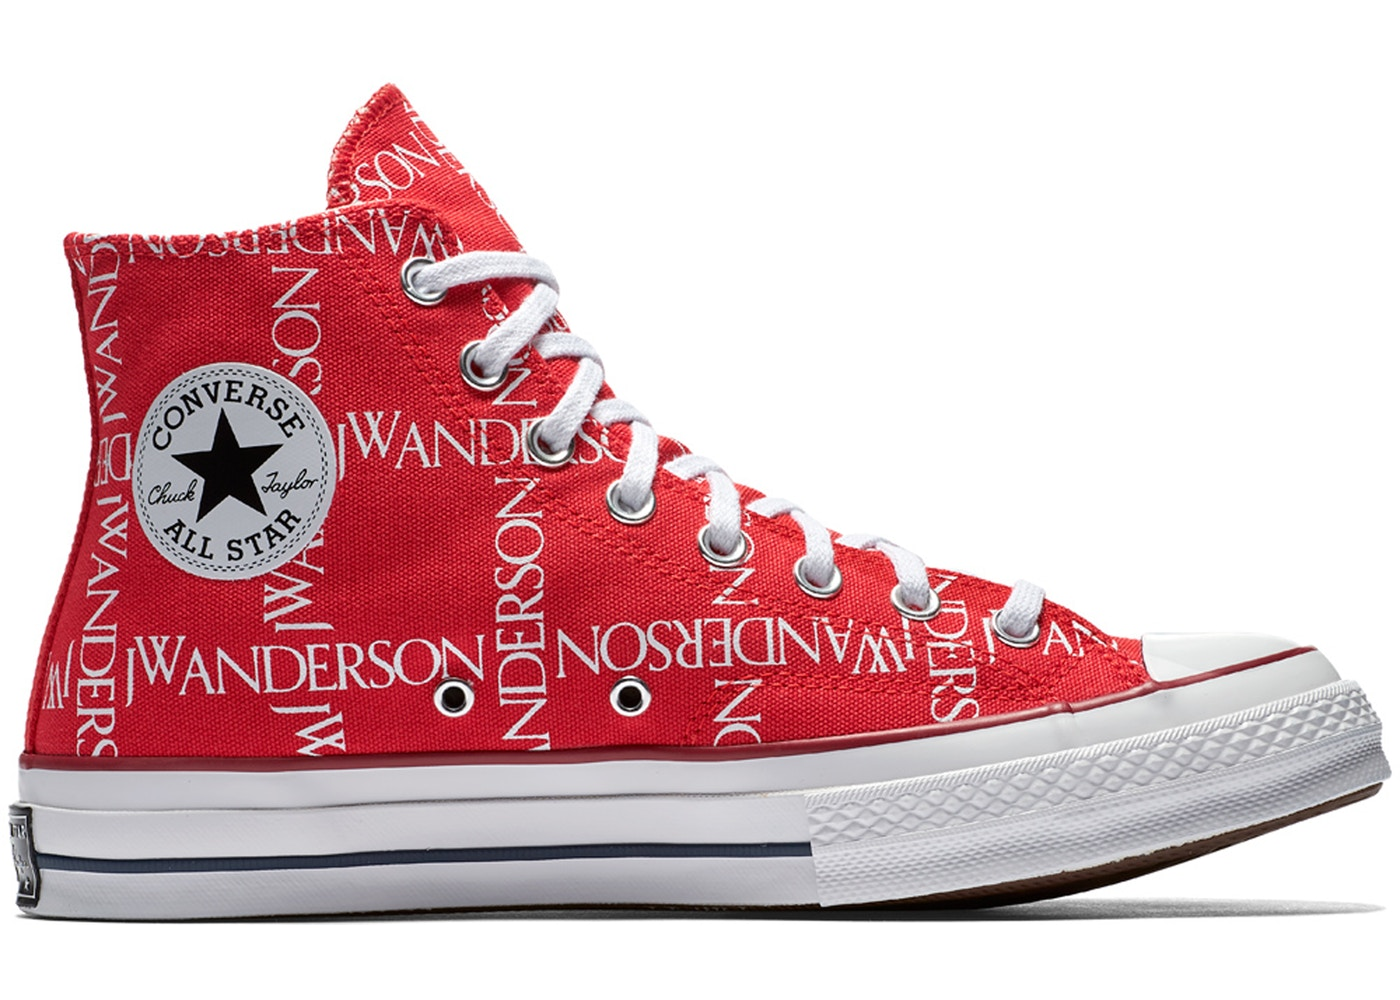 281c0c571 Converse Chuck Taylor All-Star 70s Hi Grid JW Anderson Red - 162290C